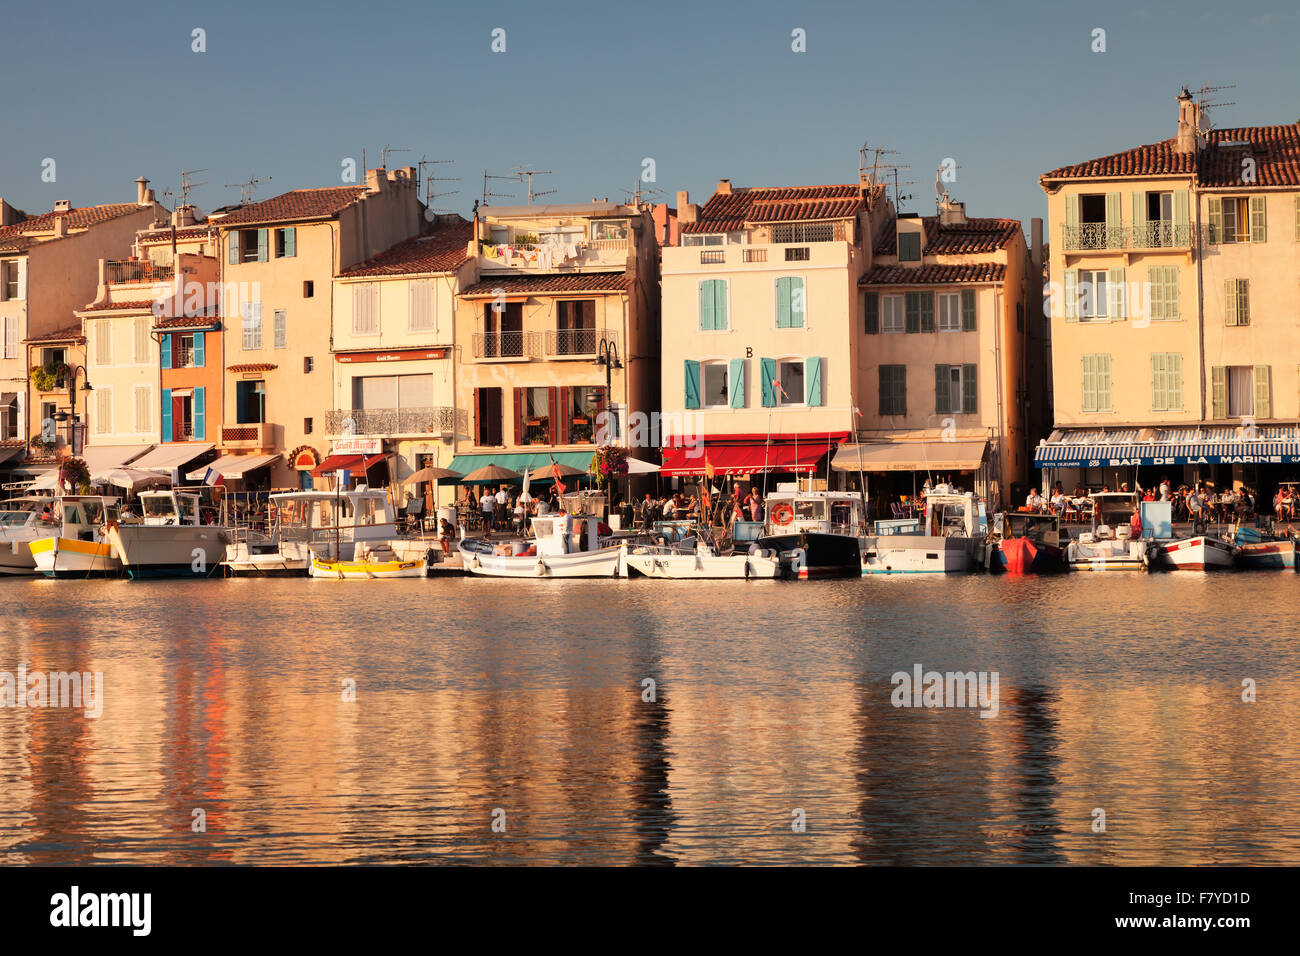 Harbour promenade, Cassis, Provence, Provence-Alpes-Cote d'Azur, Southern France, France - Stock Image